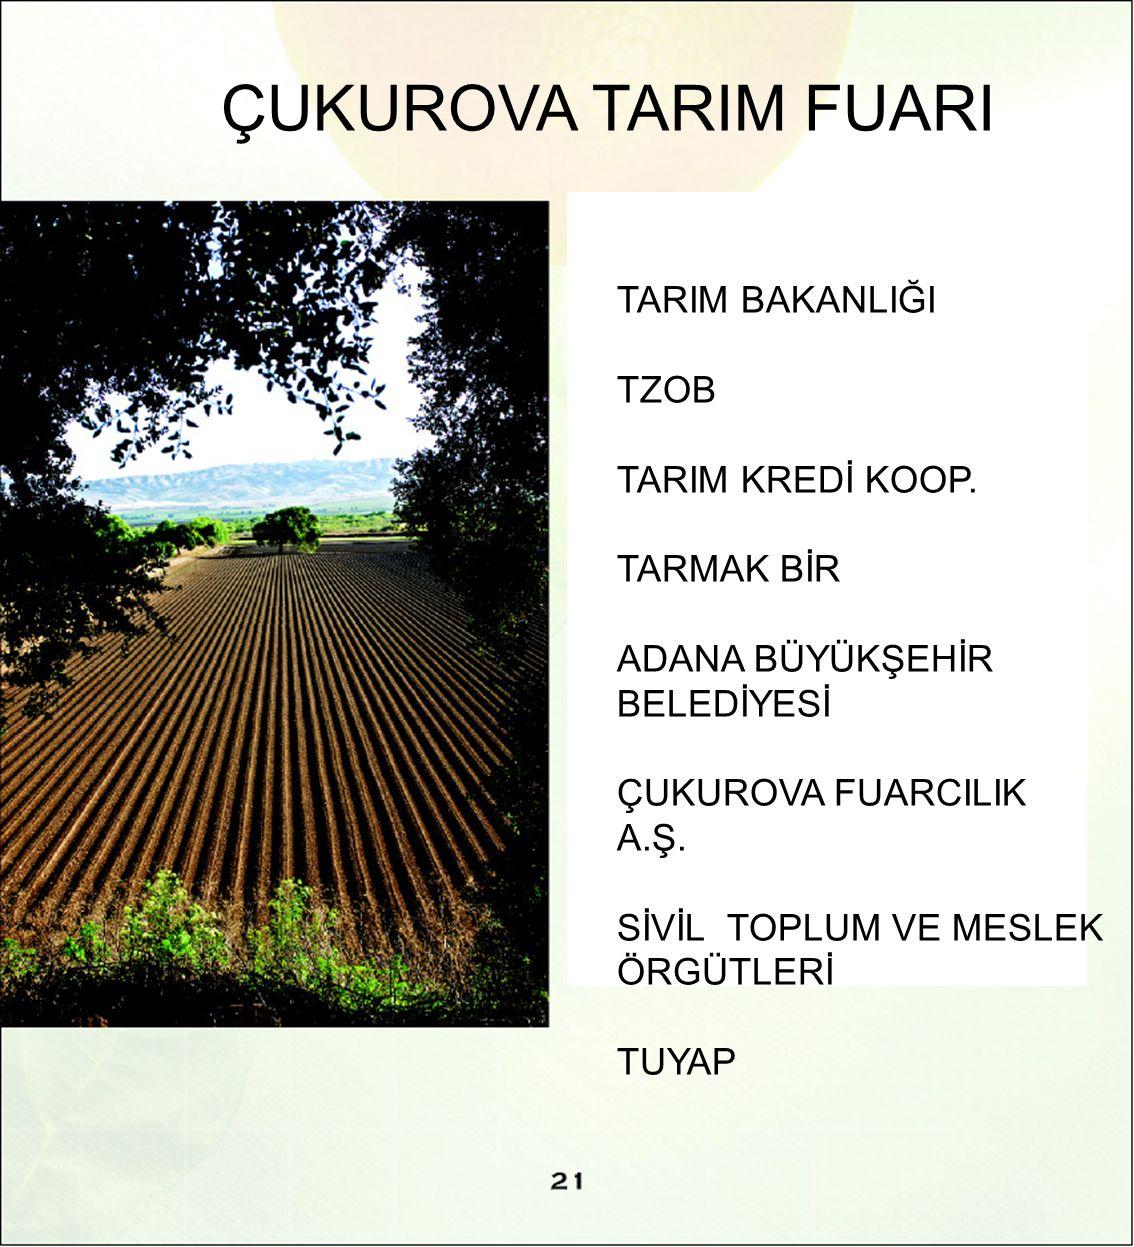 ÇUKUROVA TARIM FUARI TARIM BAKANLIĞI TZOB TARIM KREDİ KOOP.